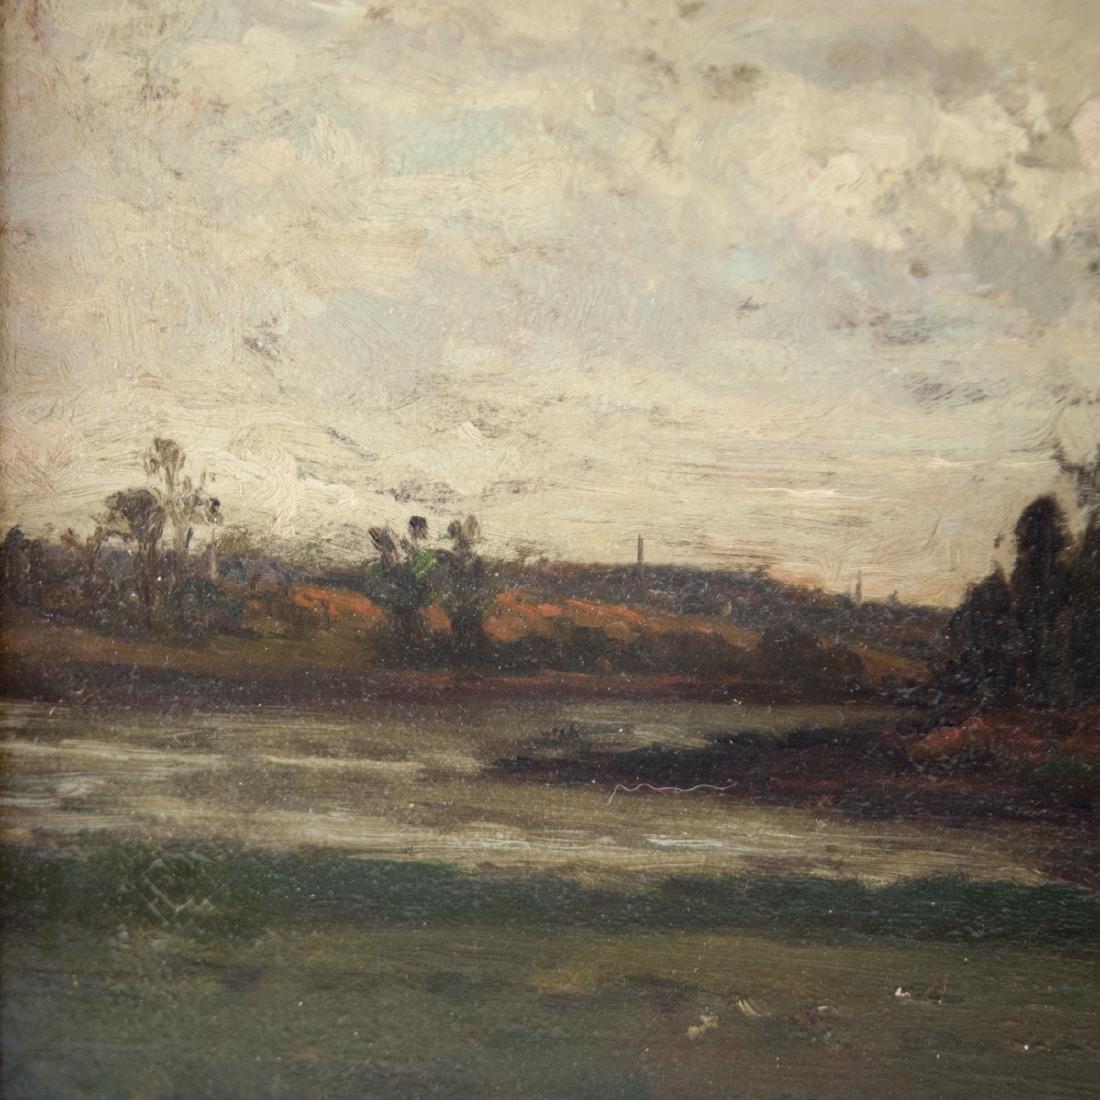 Robert Lorraine Pyne (American 1836-1905) - 5